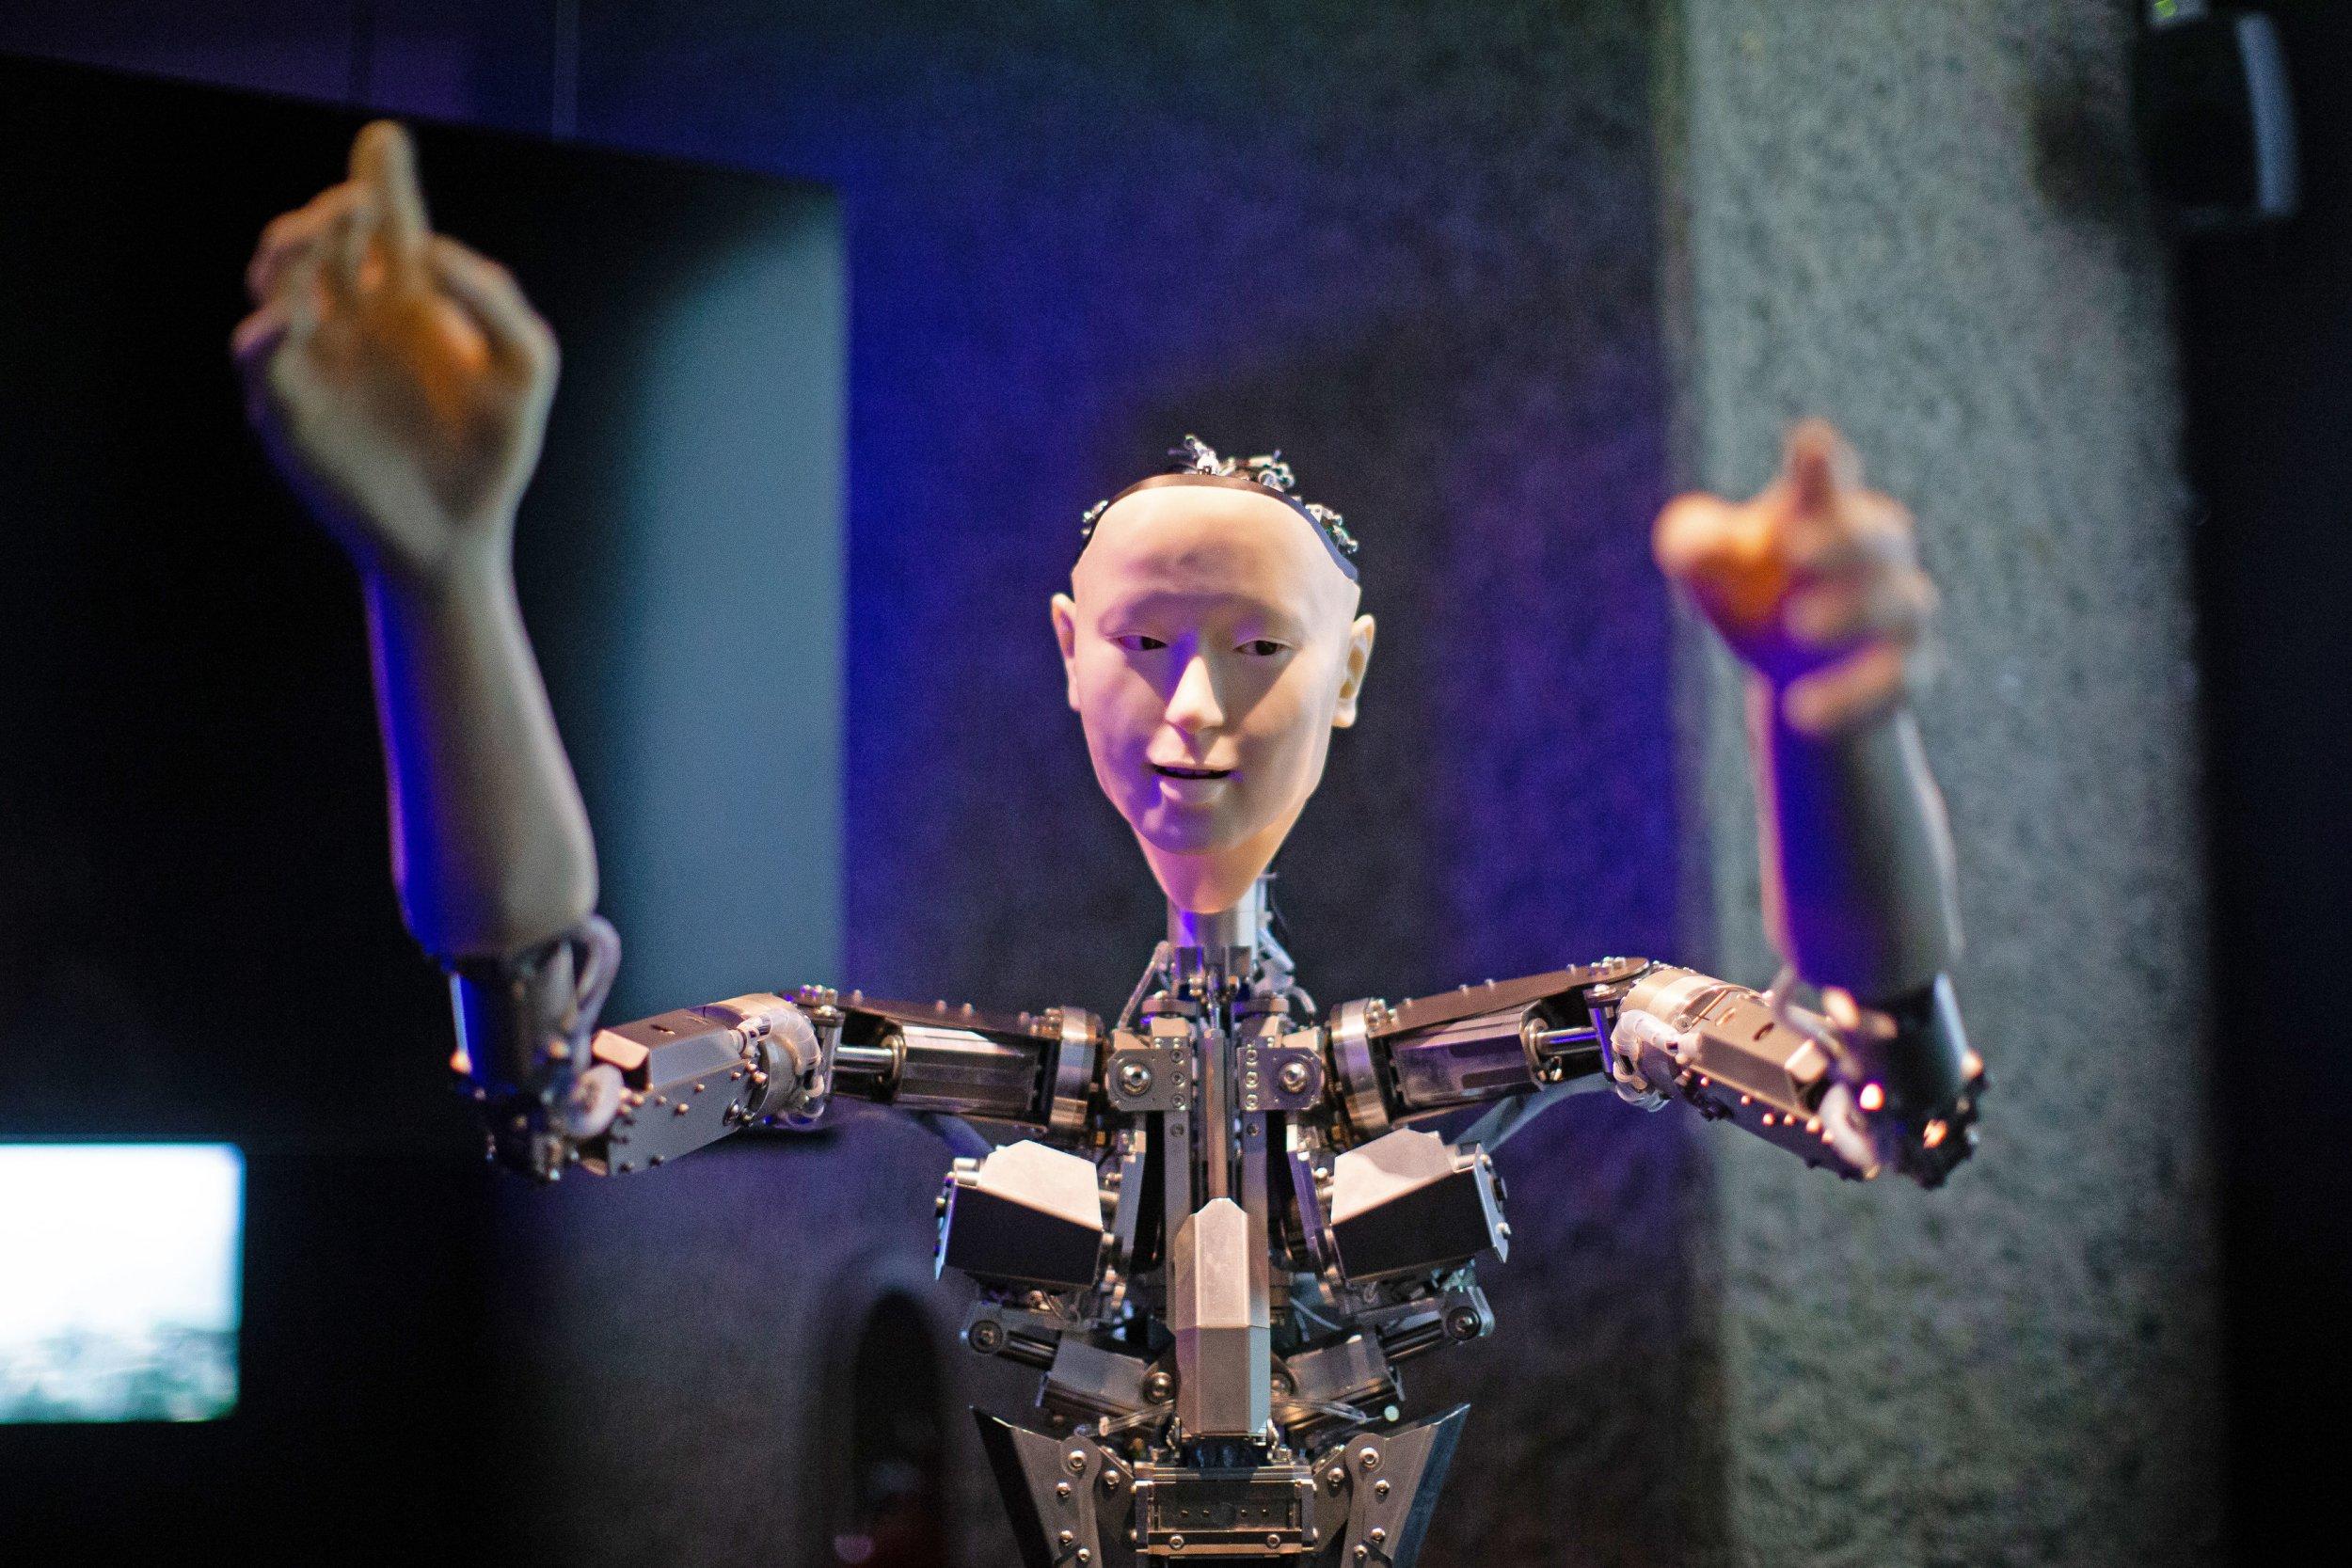 AI arrives in London as futuristic exhibition kicks off